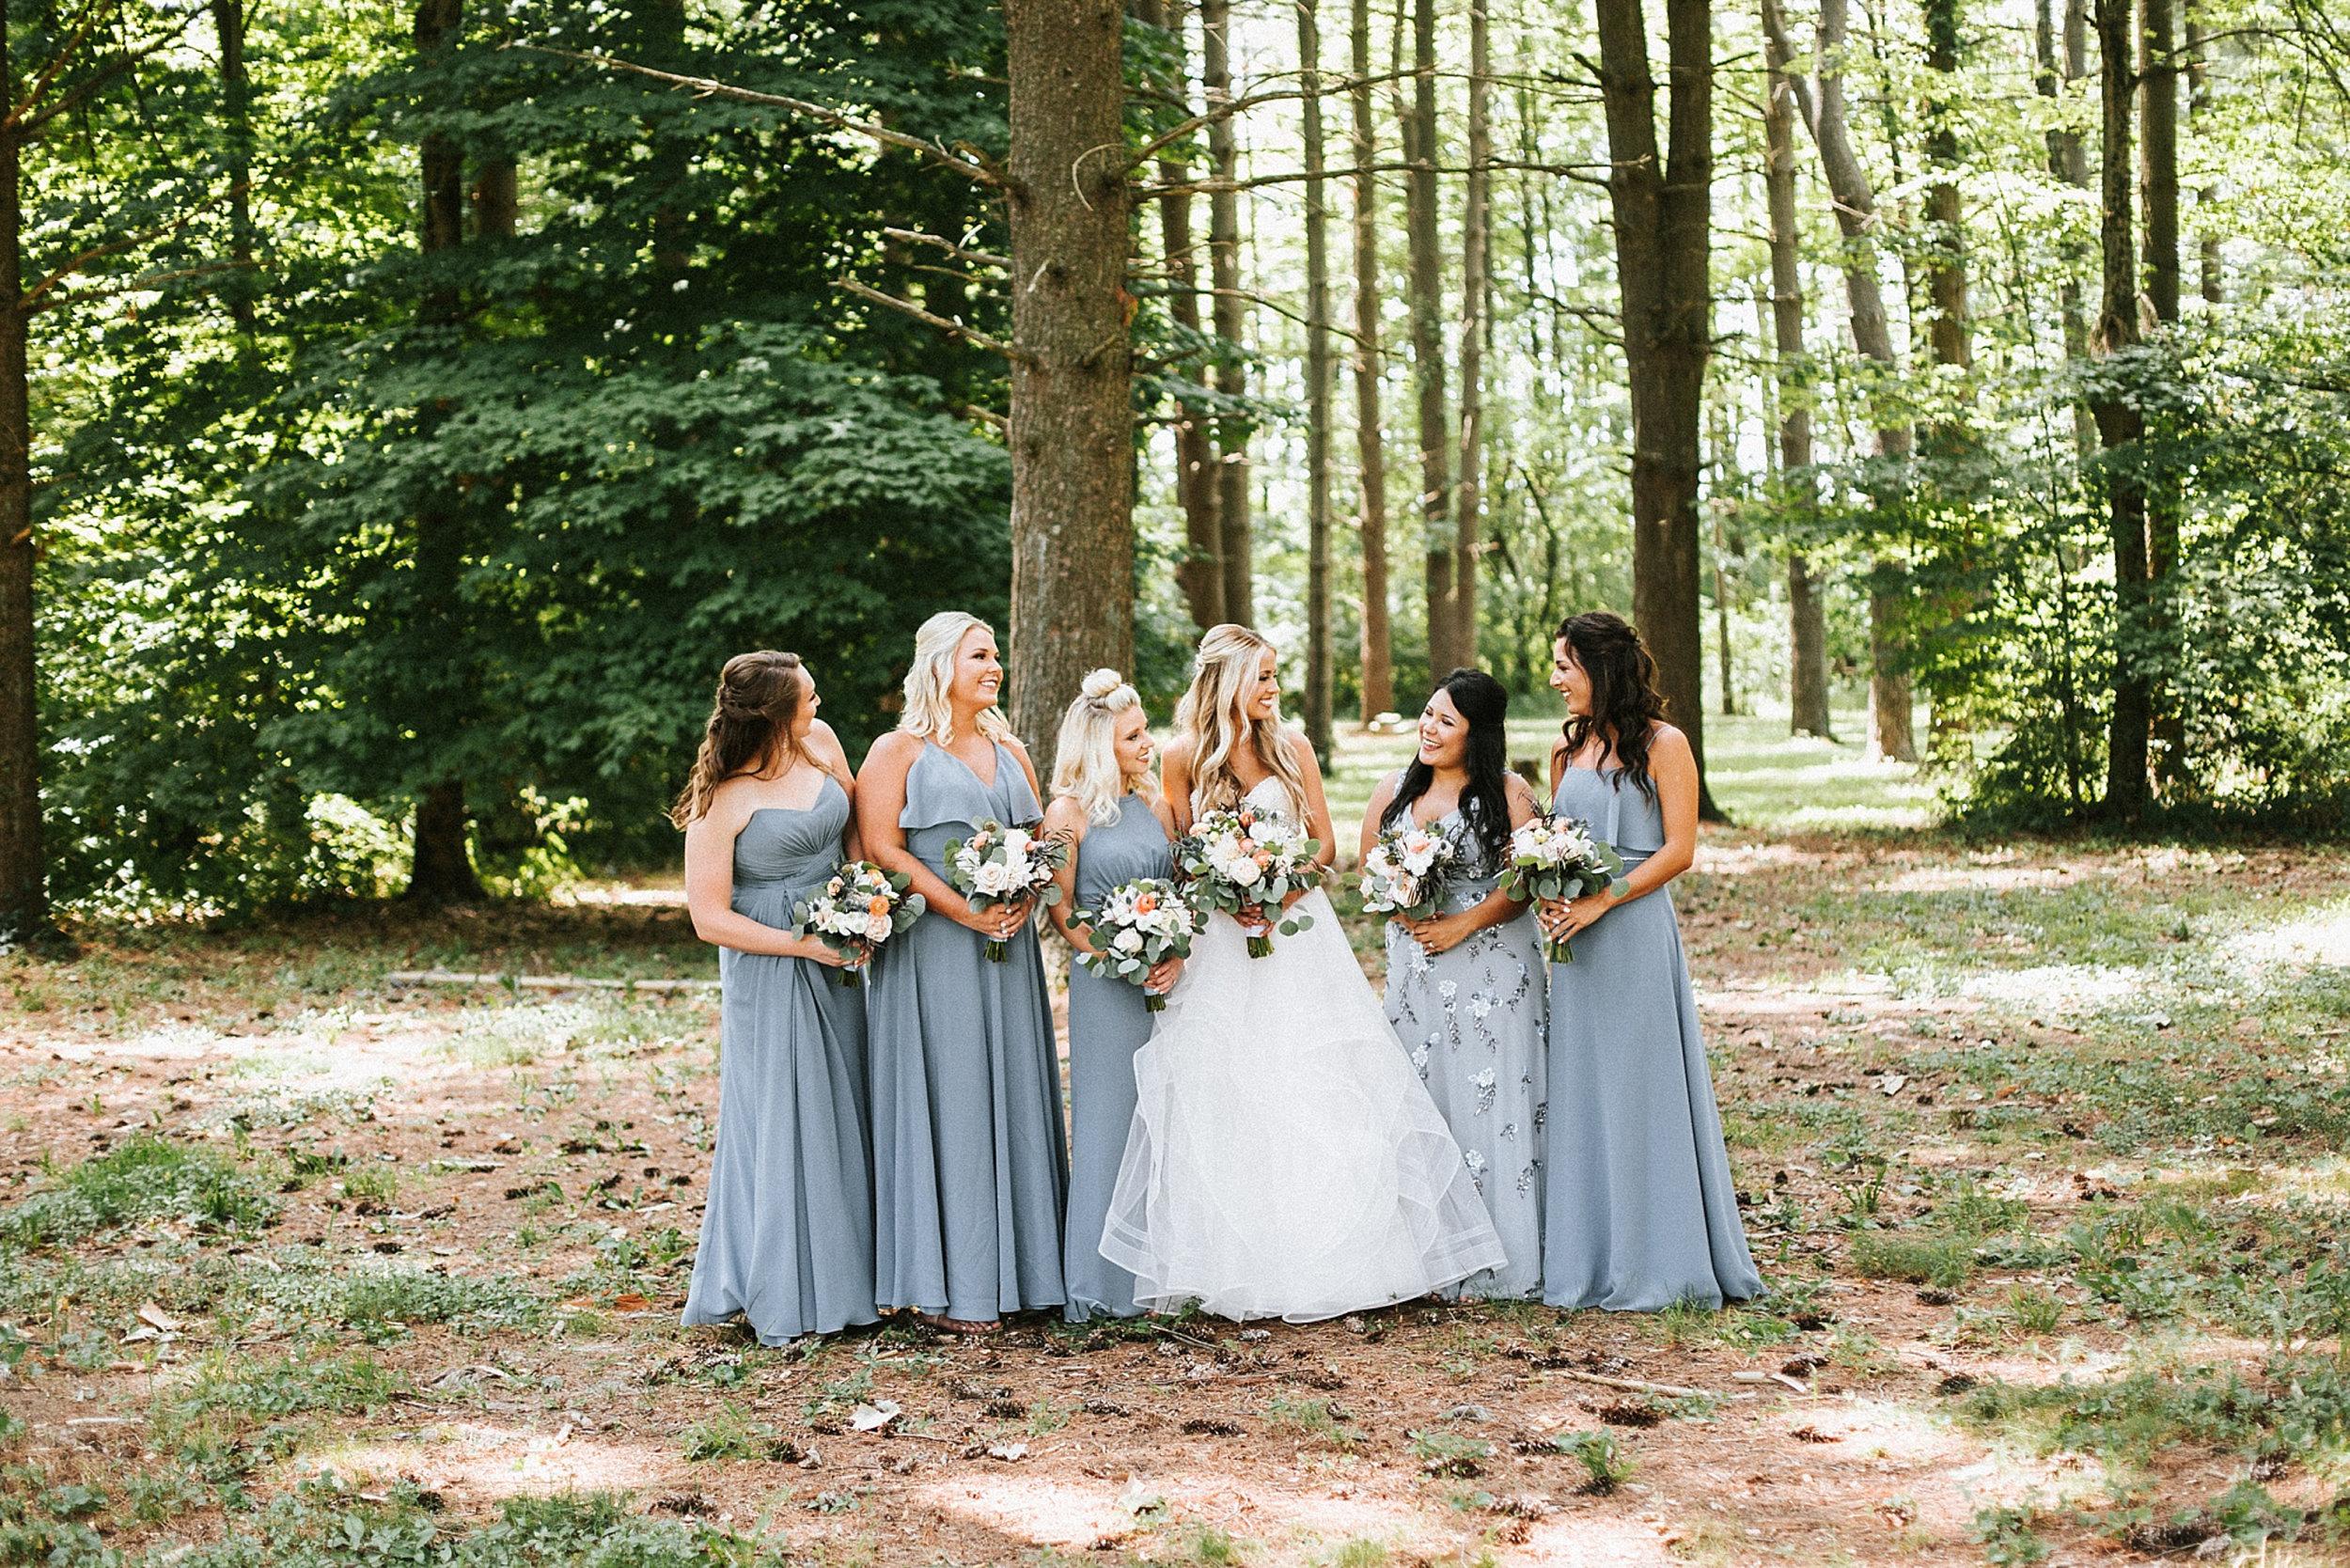 Brooke Townsend Photography - Cincinnati Wedding Photographer (13 of 153).jpg